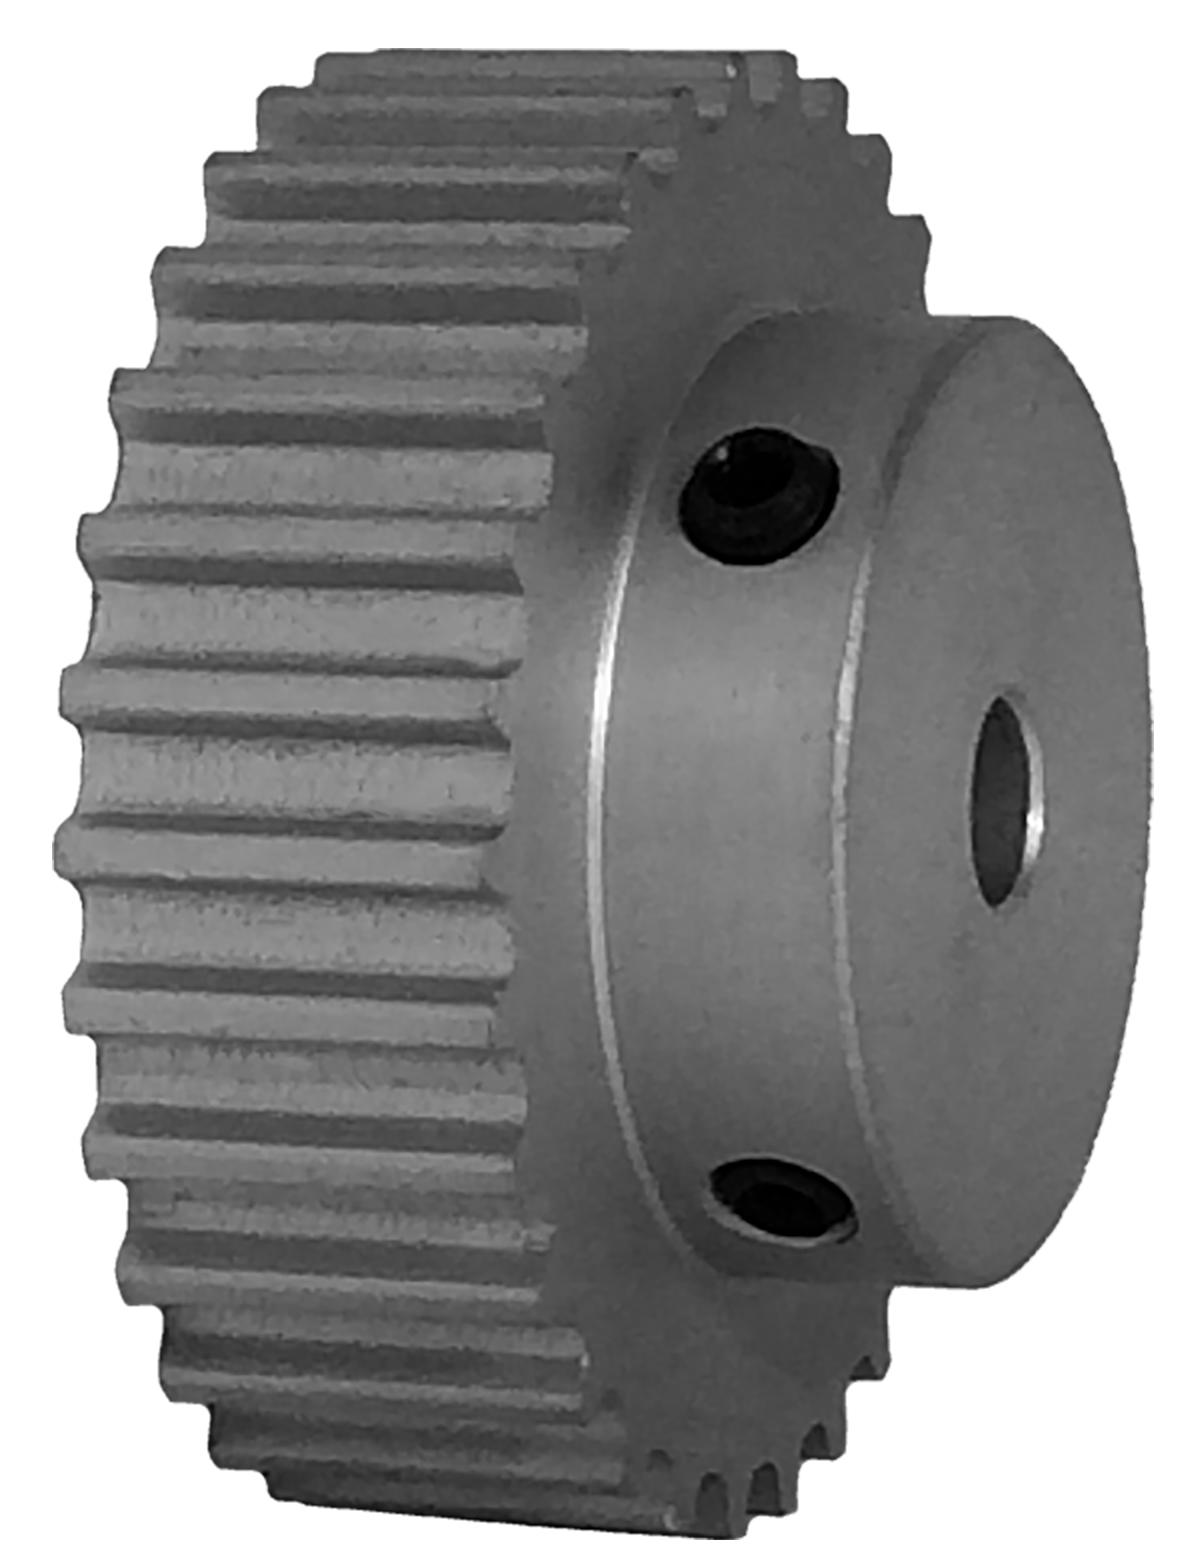 30-5M09-6A3 - Aluminum Powerhouse®HTD® Pulleys